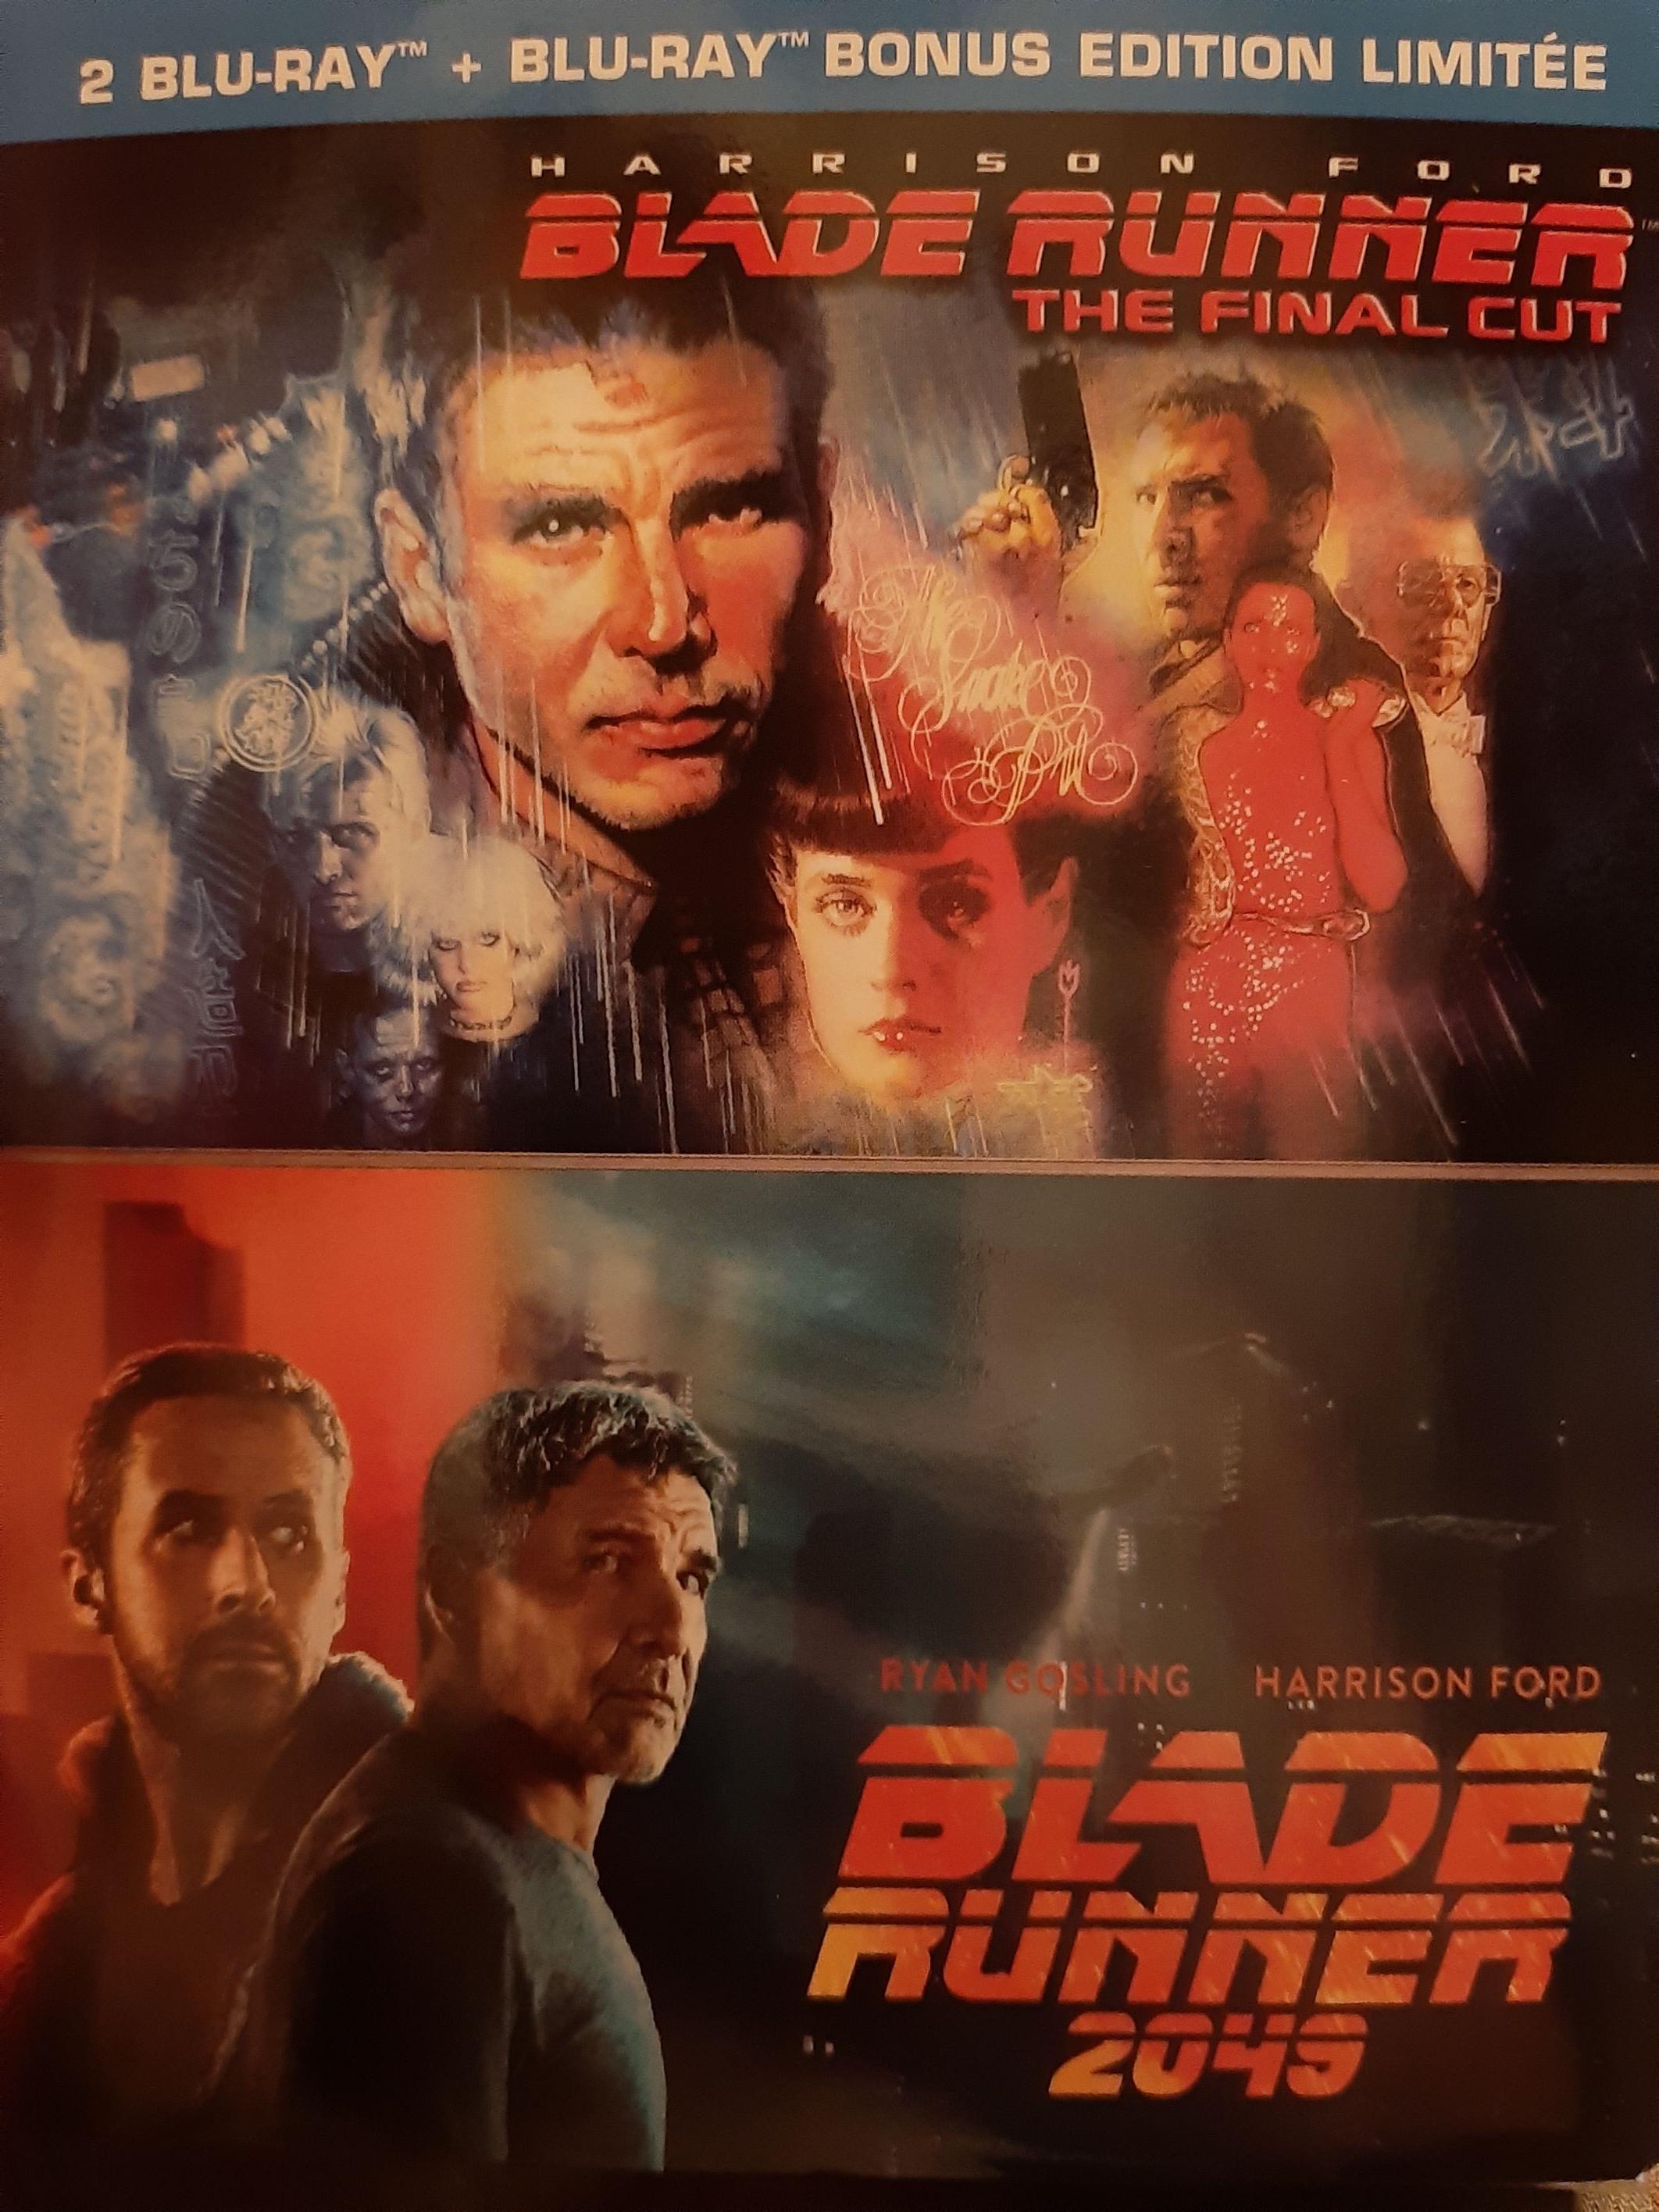 Coffret Blu-ray Blade Runner + Blade Runner 2049 - NOZ Marsannay (21)